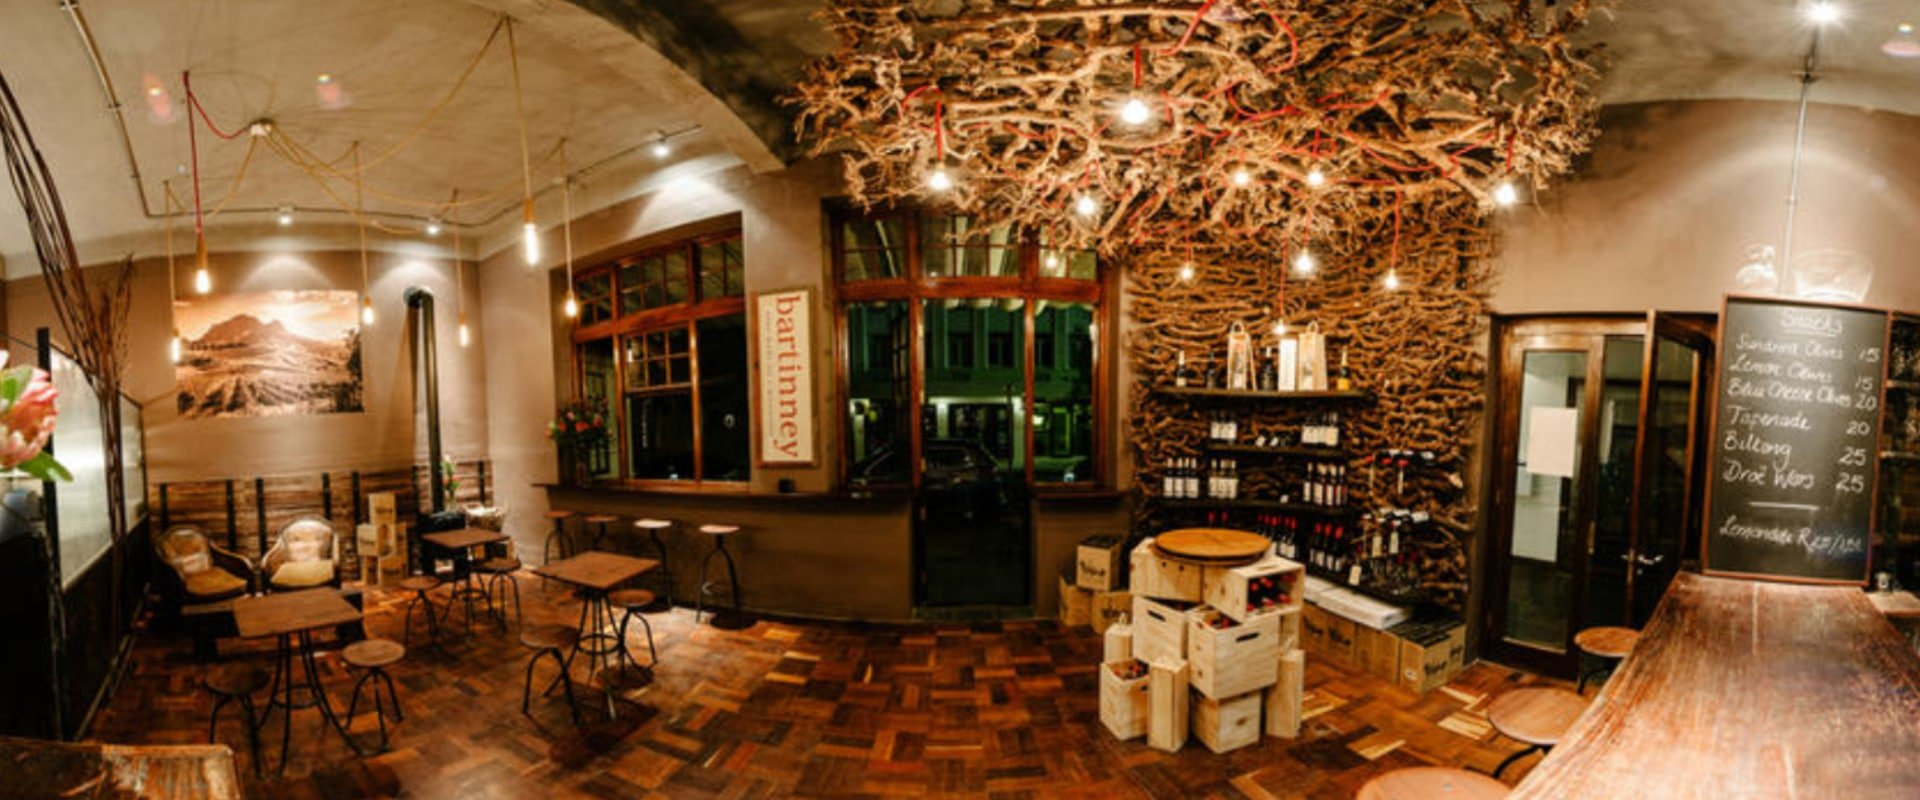 Experience a Wine & Fynbos tasting